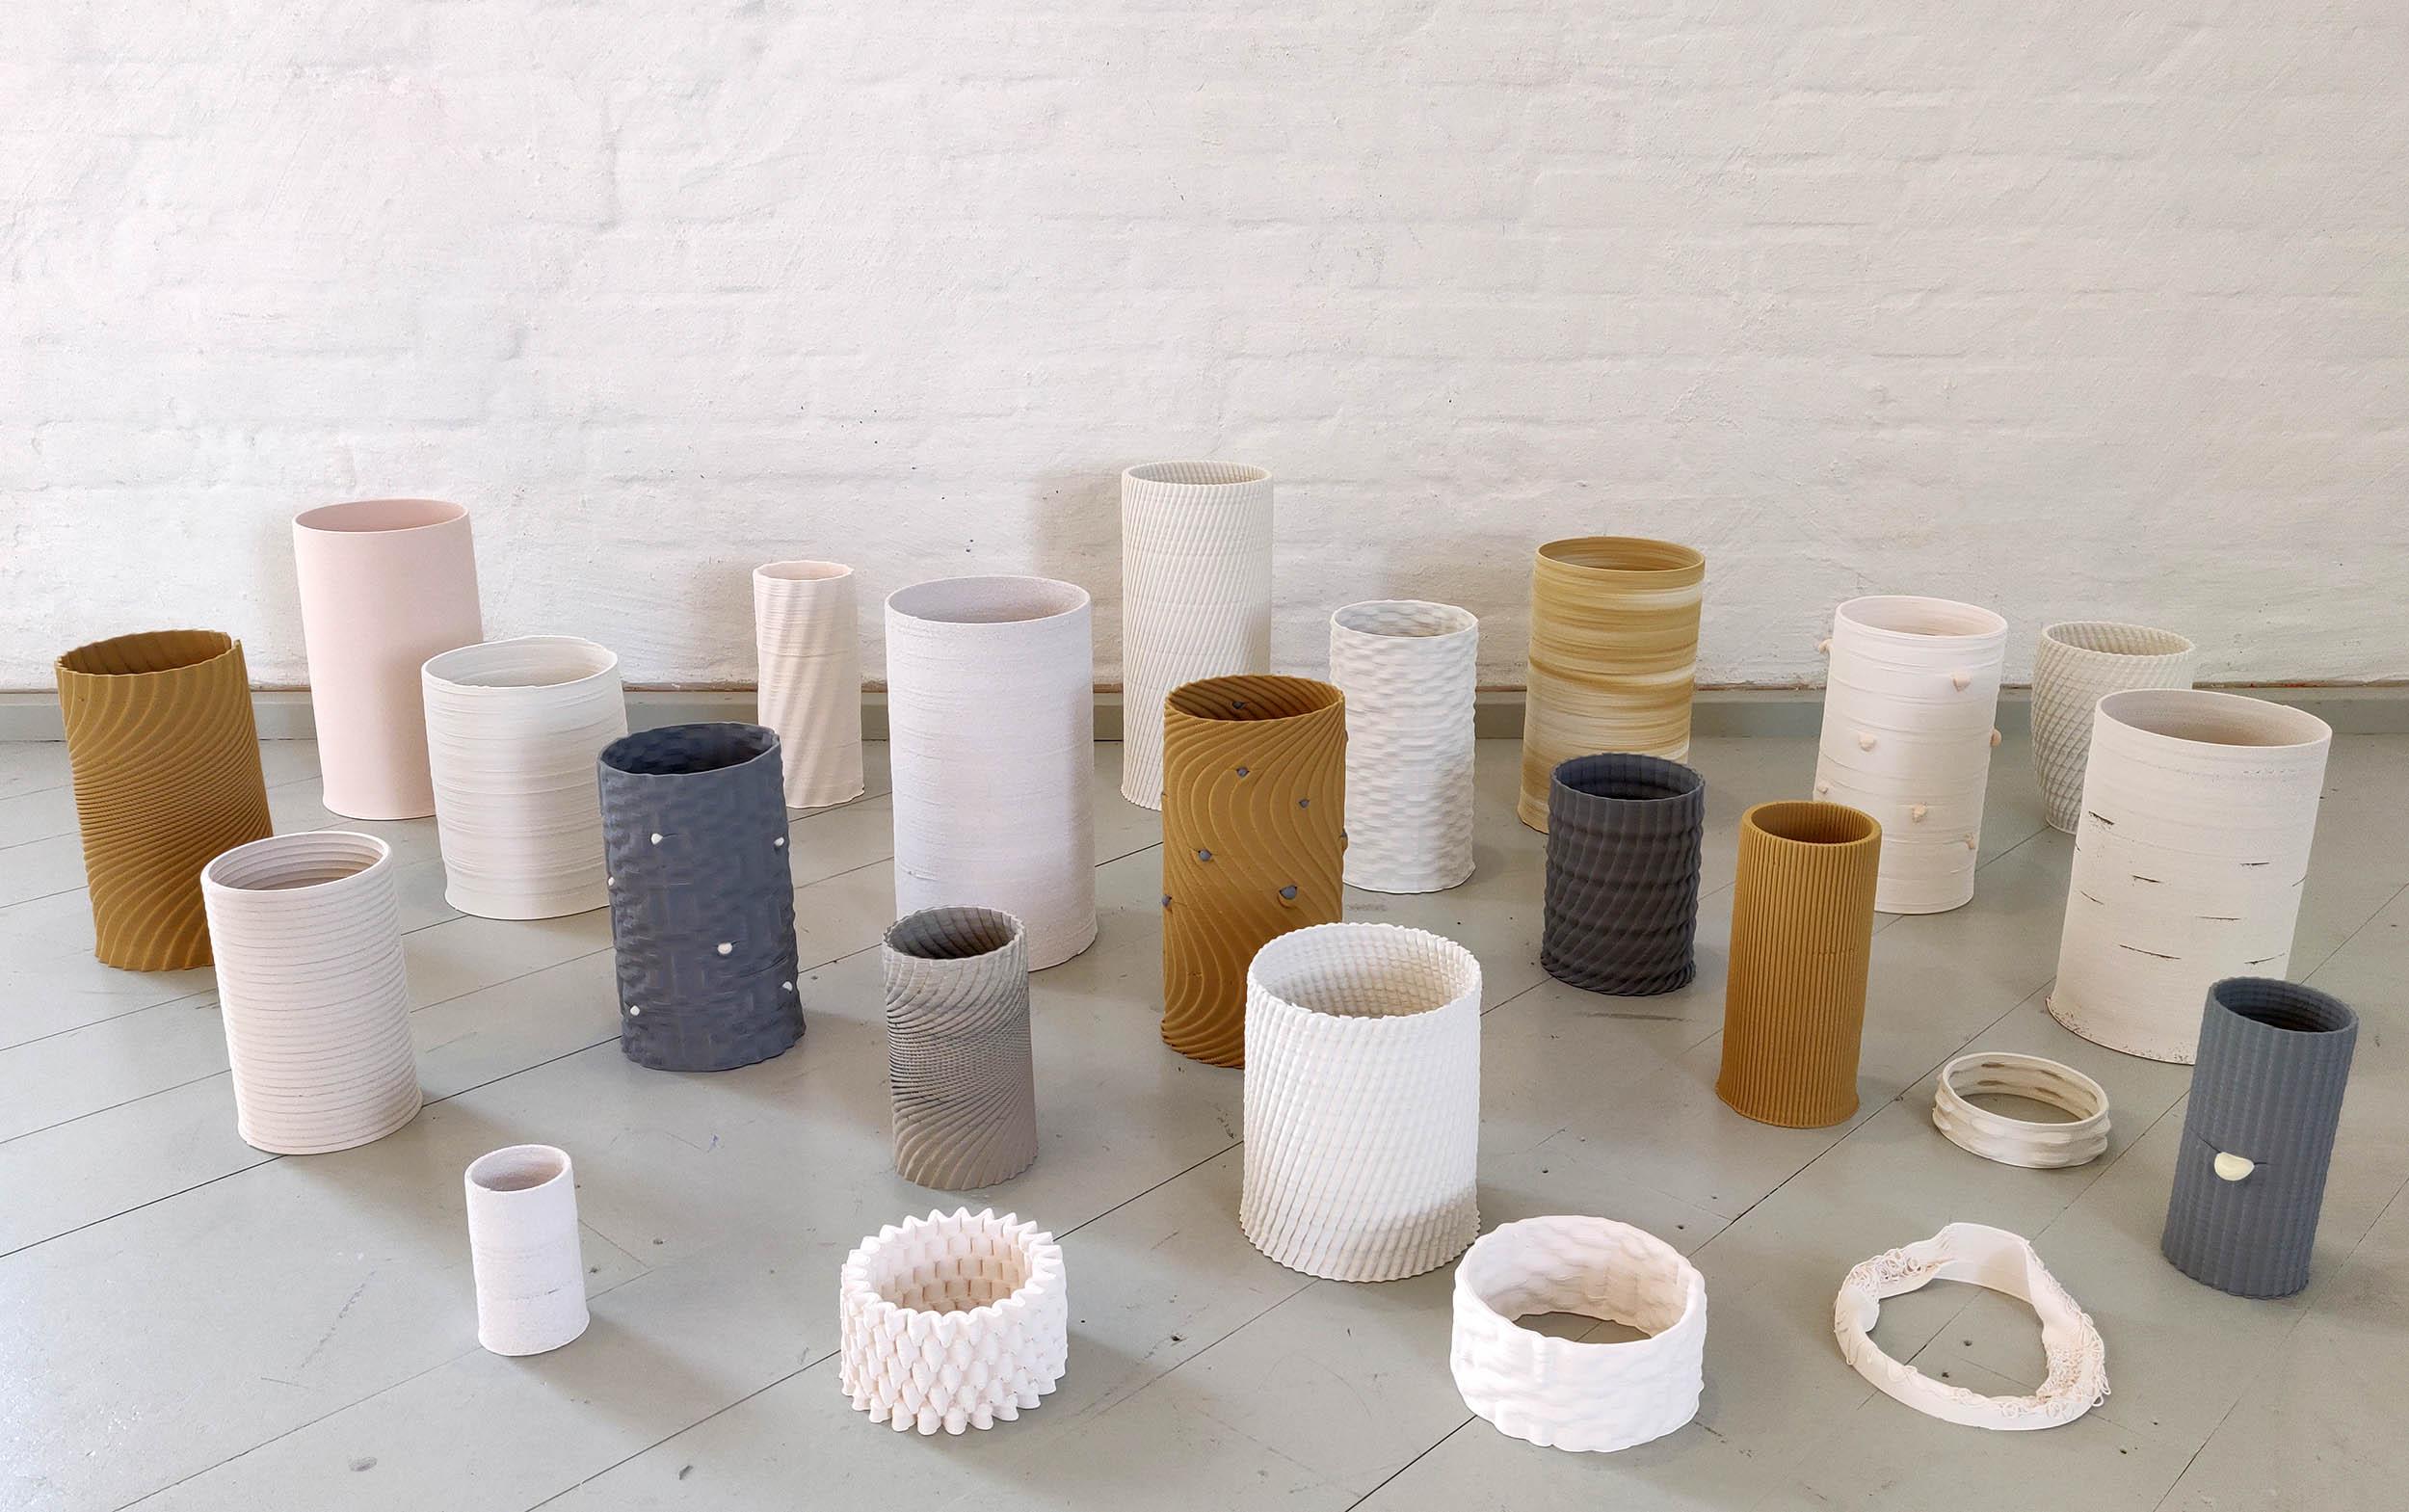 Hilda Nilsson: Digital Coiling – Material Modelling Machine